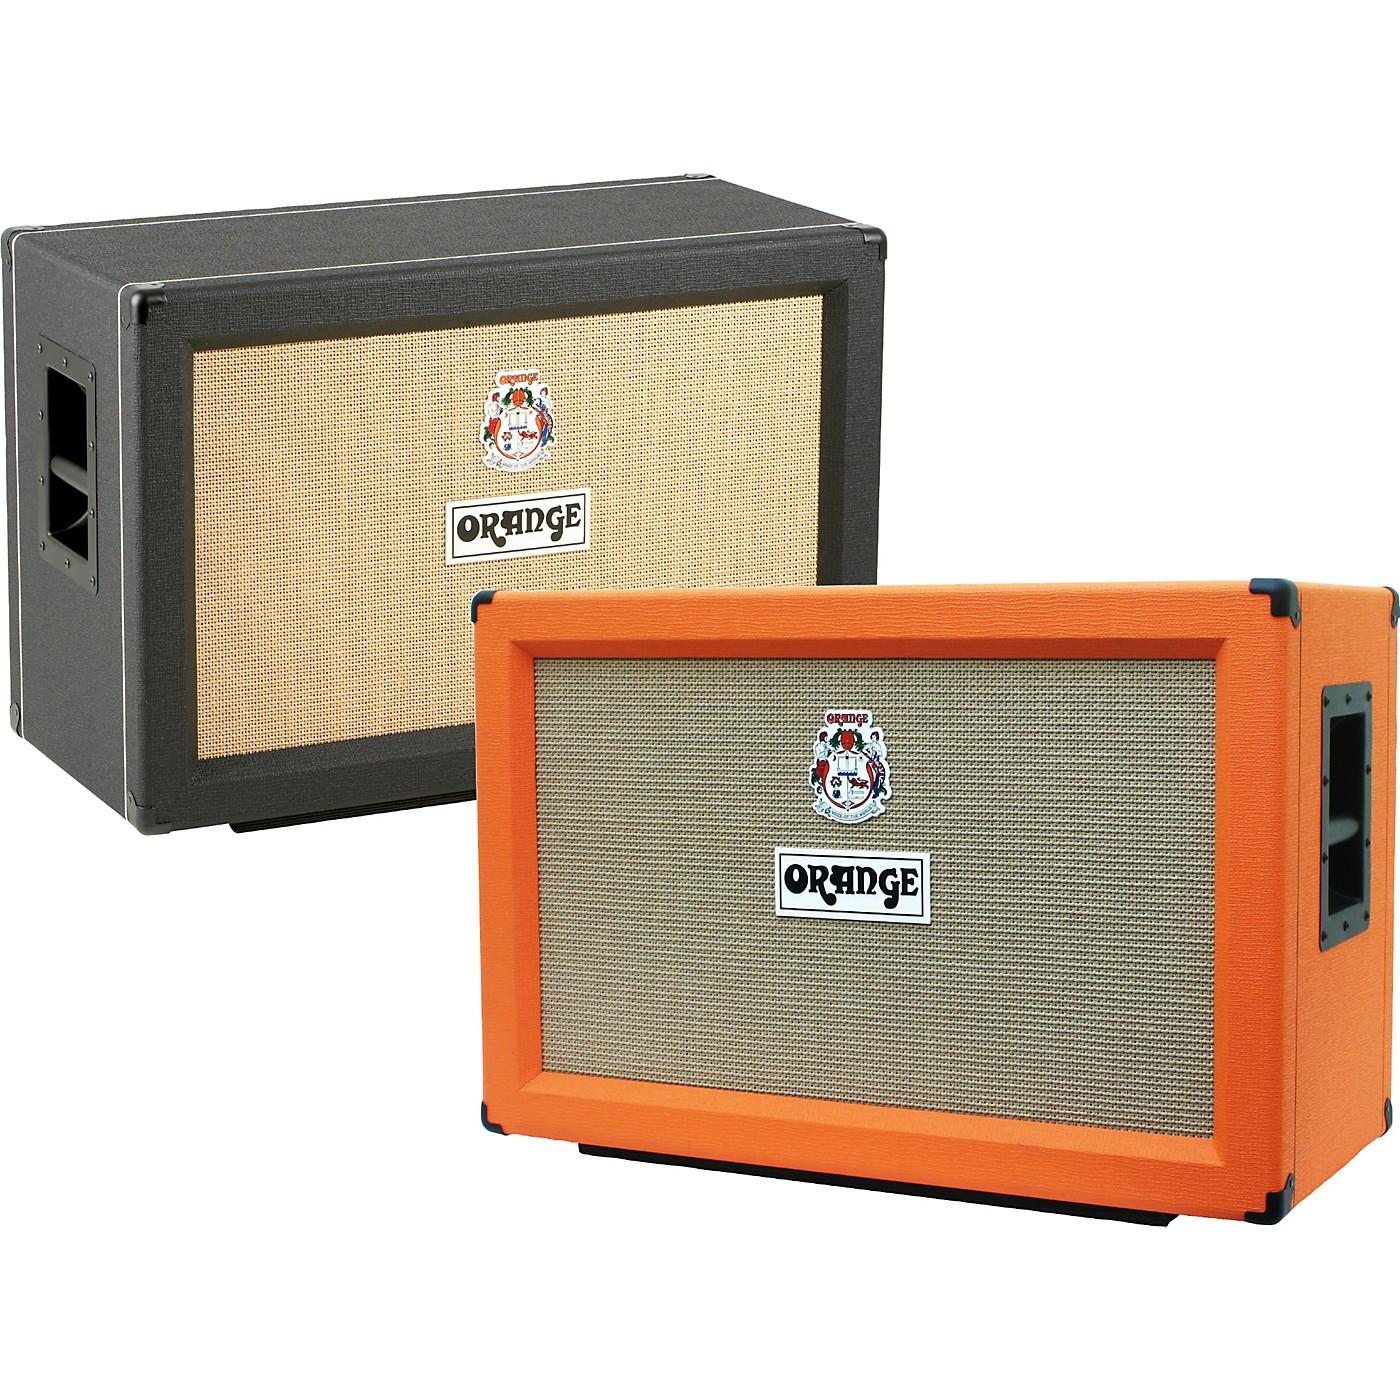 Orange Amplifiers PPC Series PPC212-C 120W 2x12 Closed Back Guitar Speaker Cabinet thumbnail